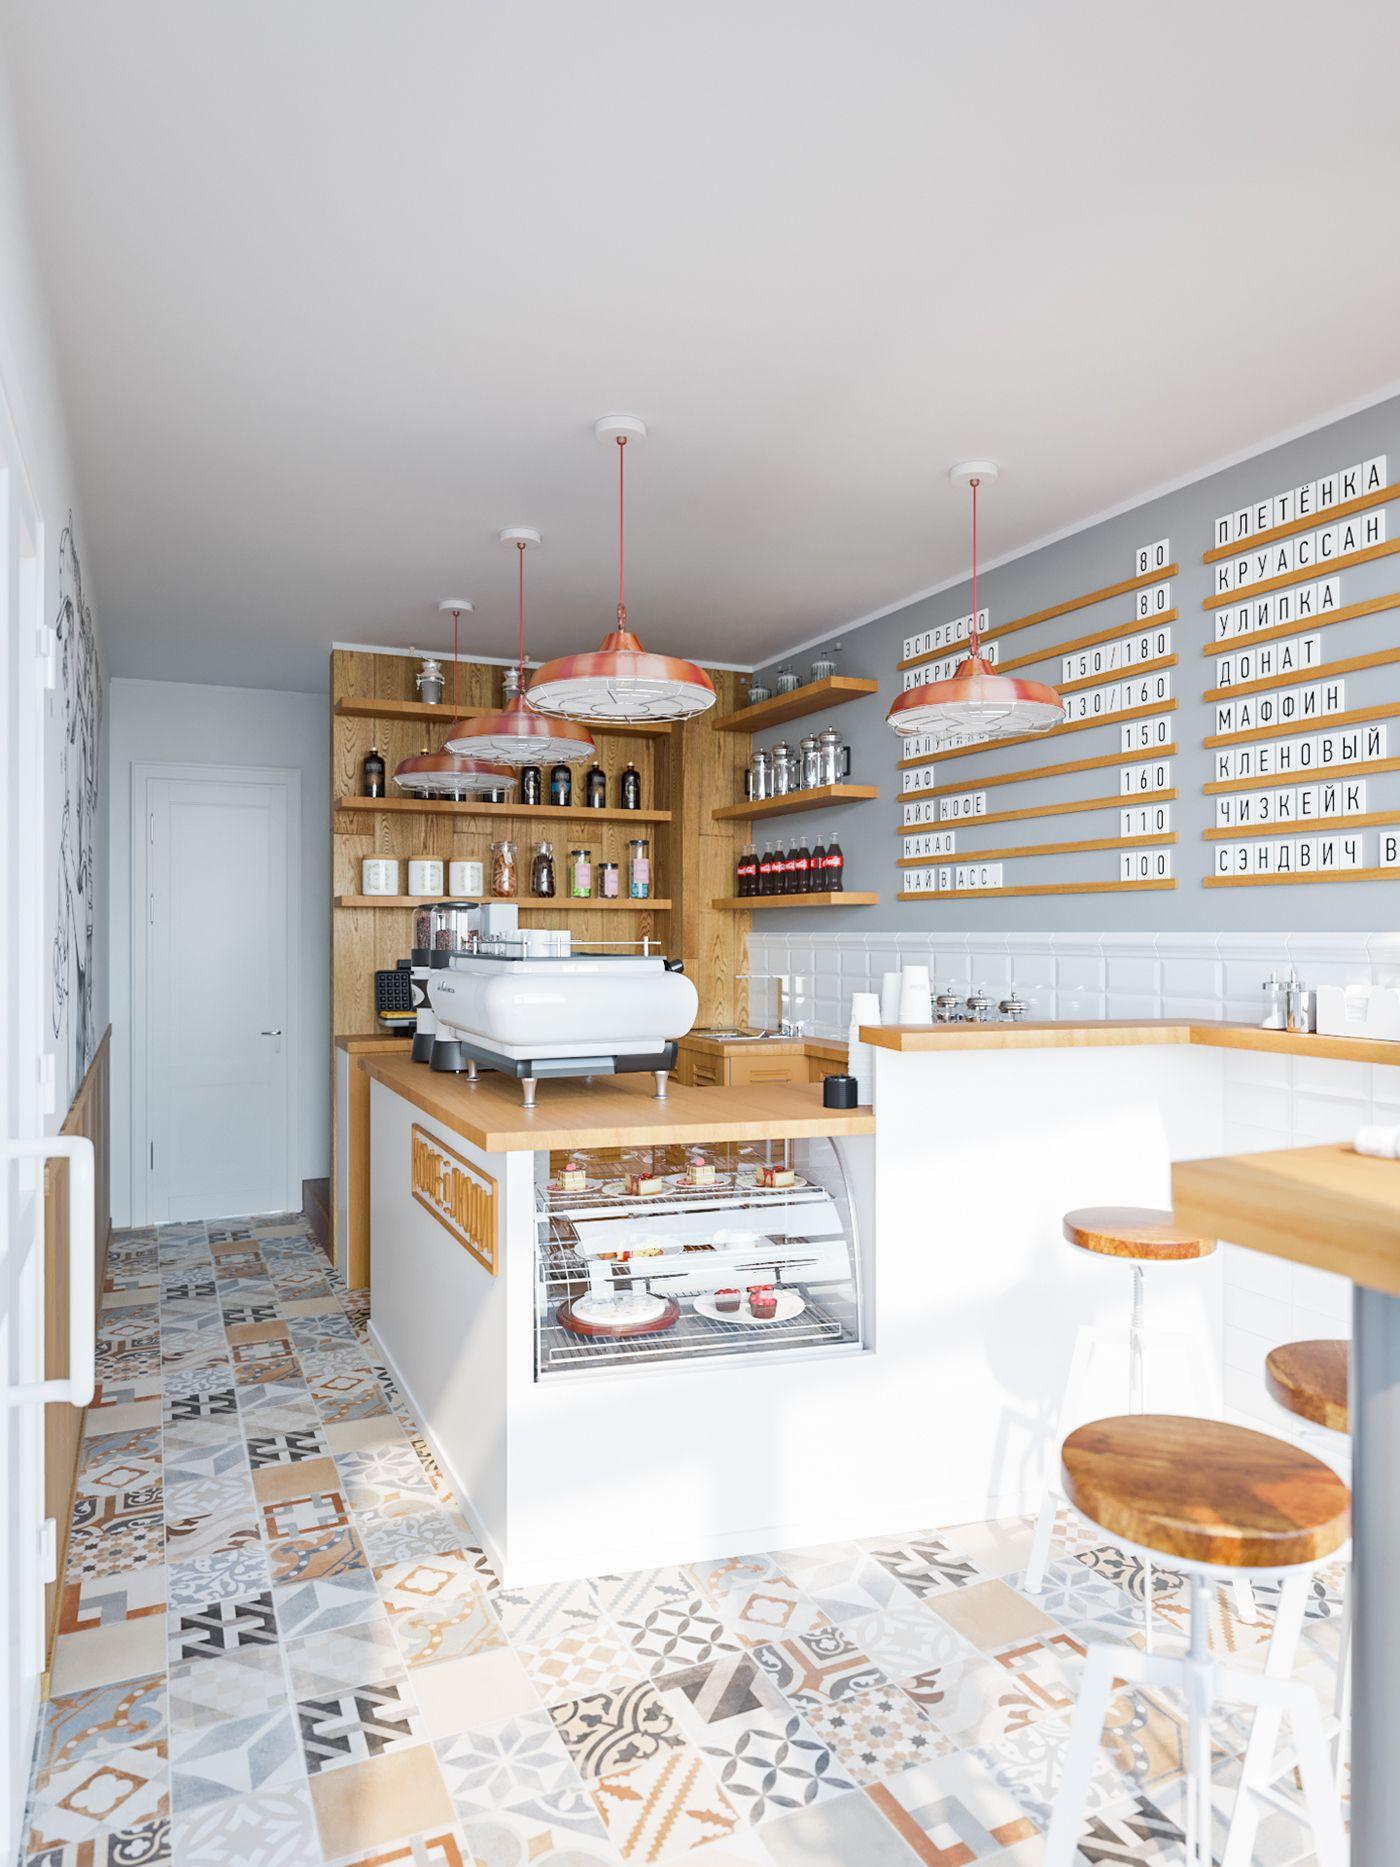 Coffee And People Cafe Interior Интерьер пекарни Дизайн маленького кафе Дизайн фасадов магазина